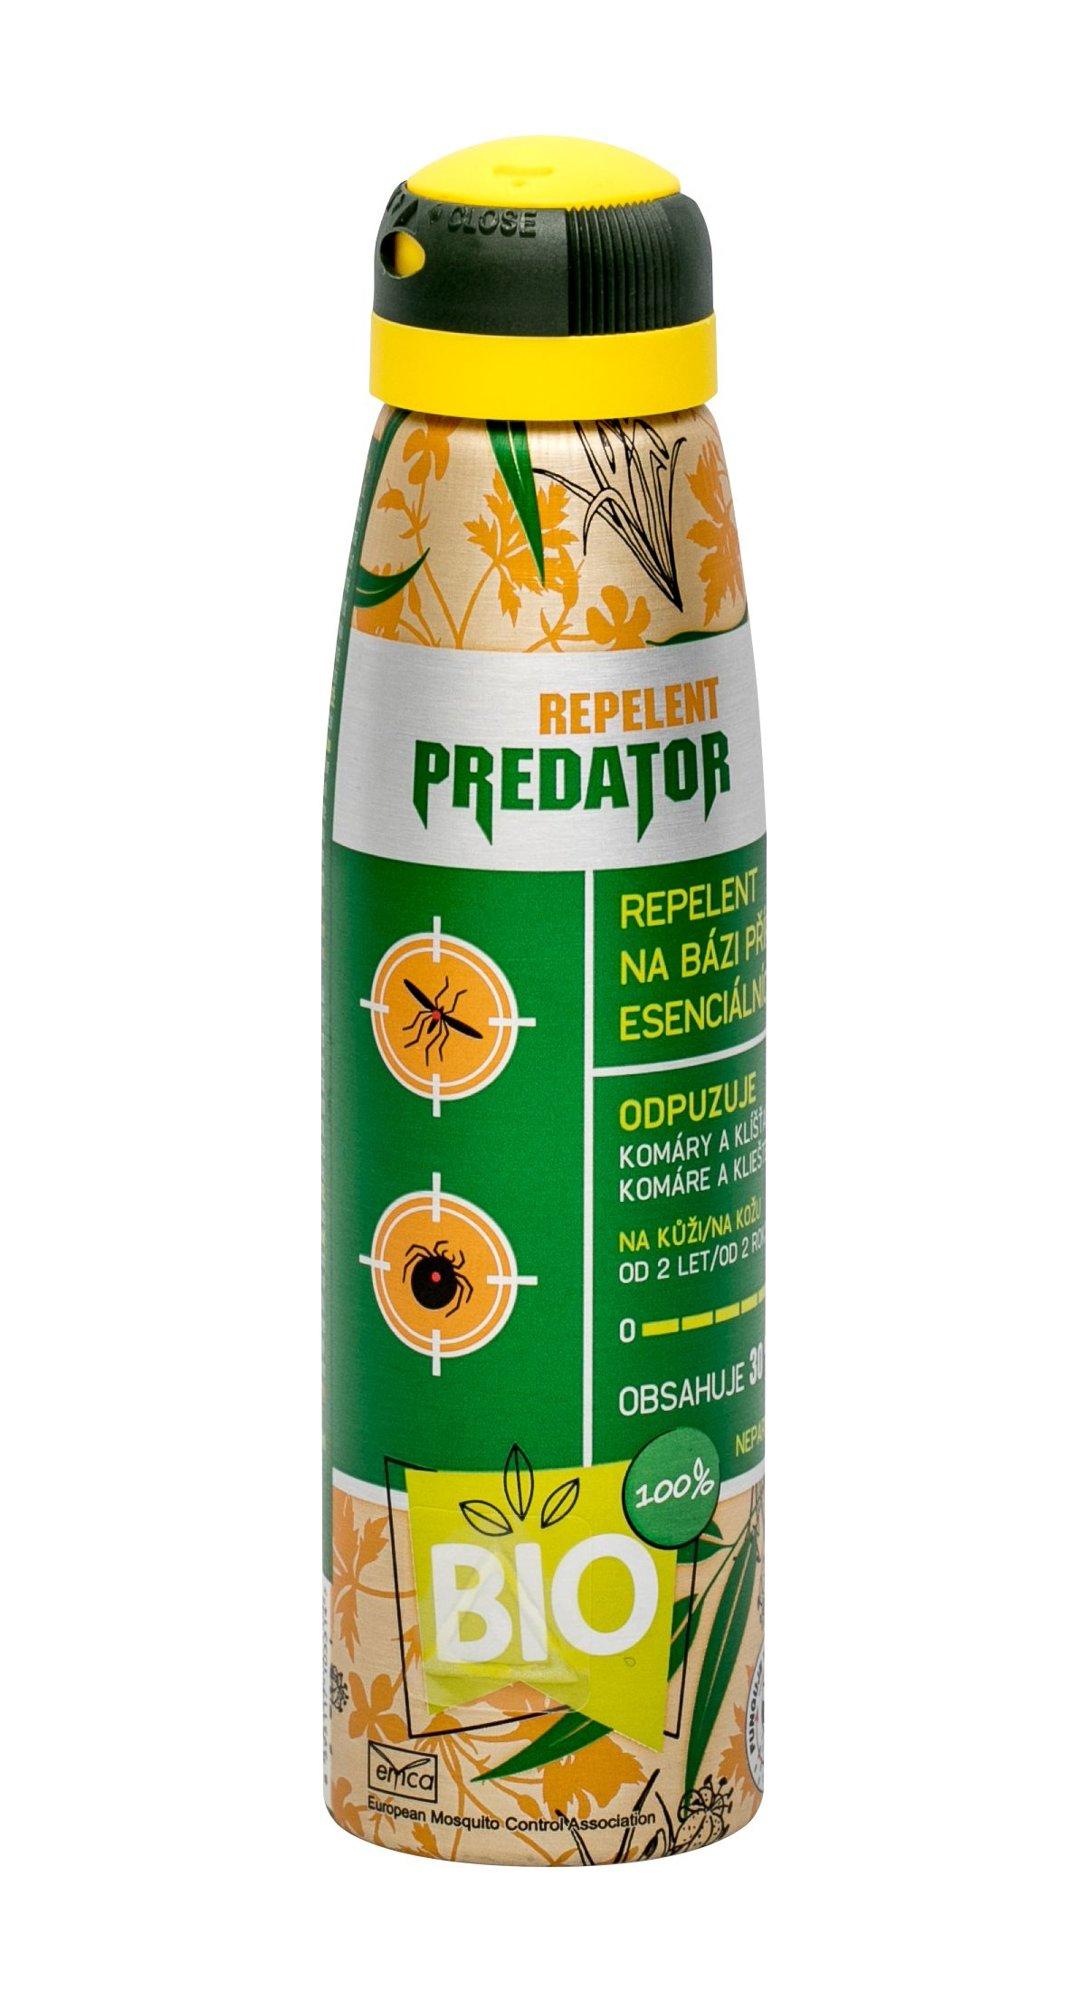 PREDATOR Repelent Repellent 150ml